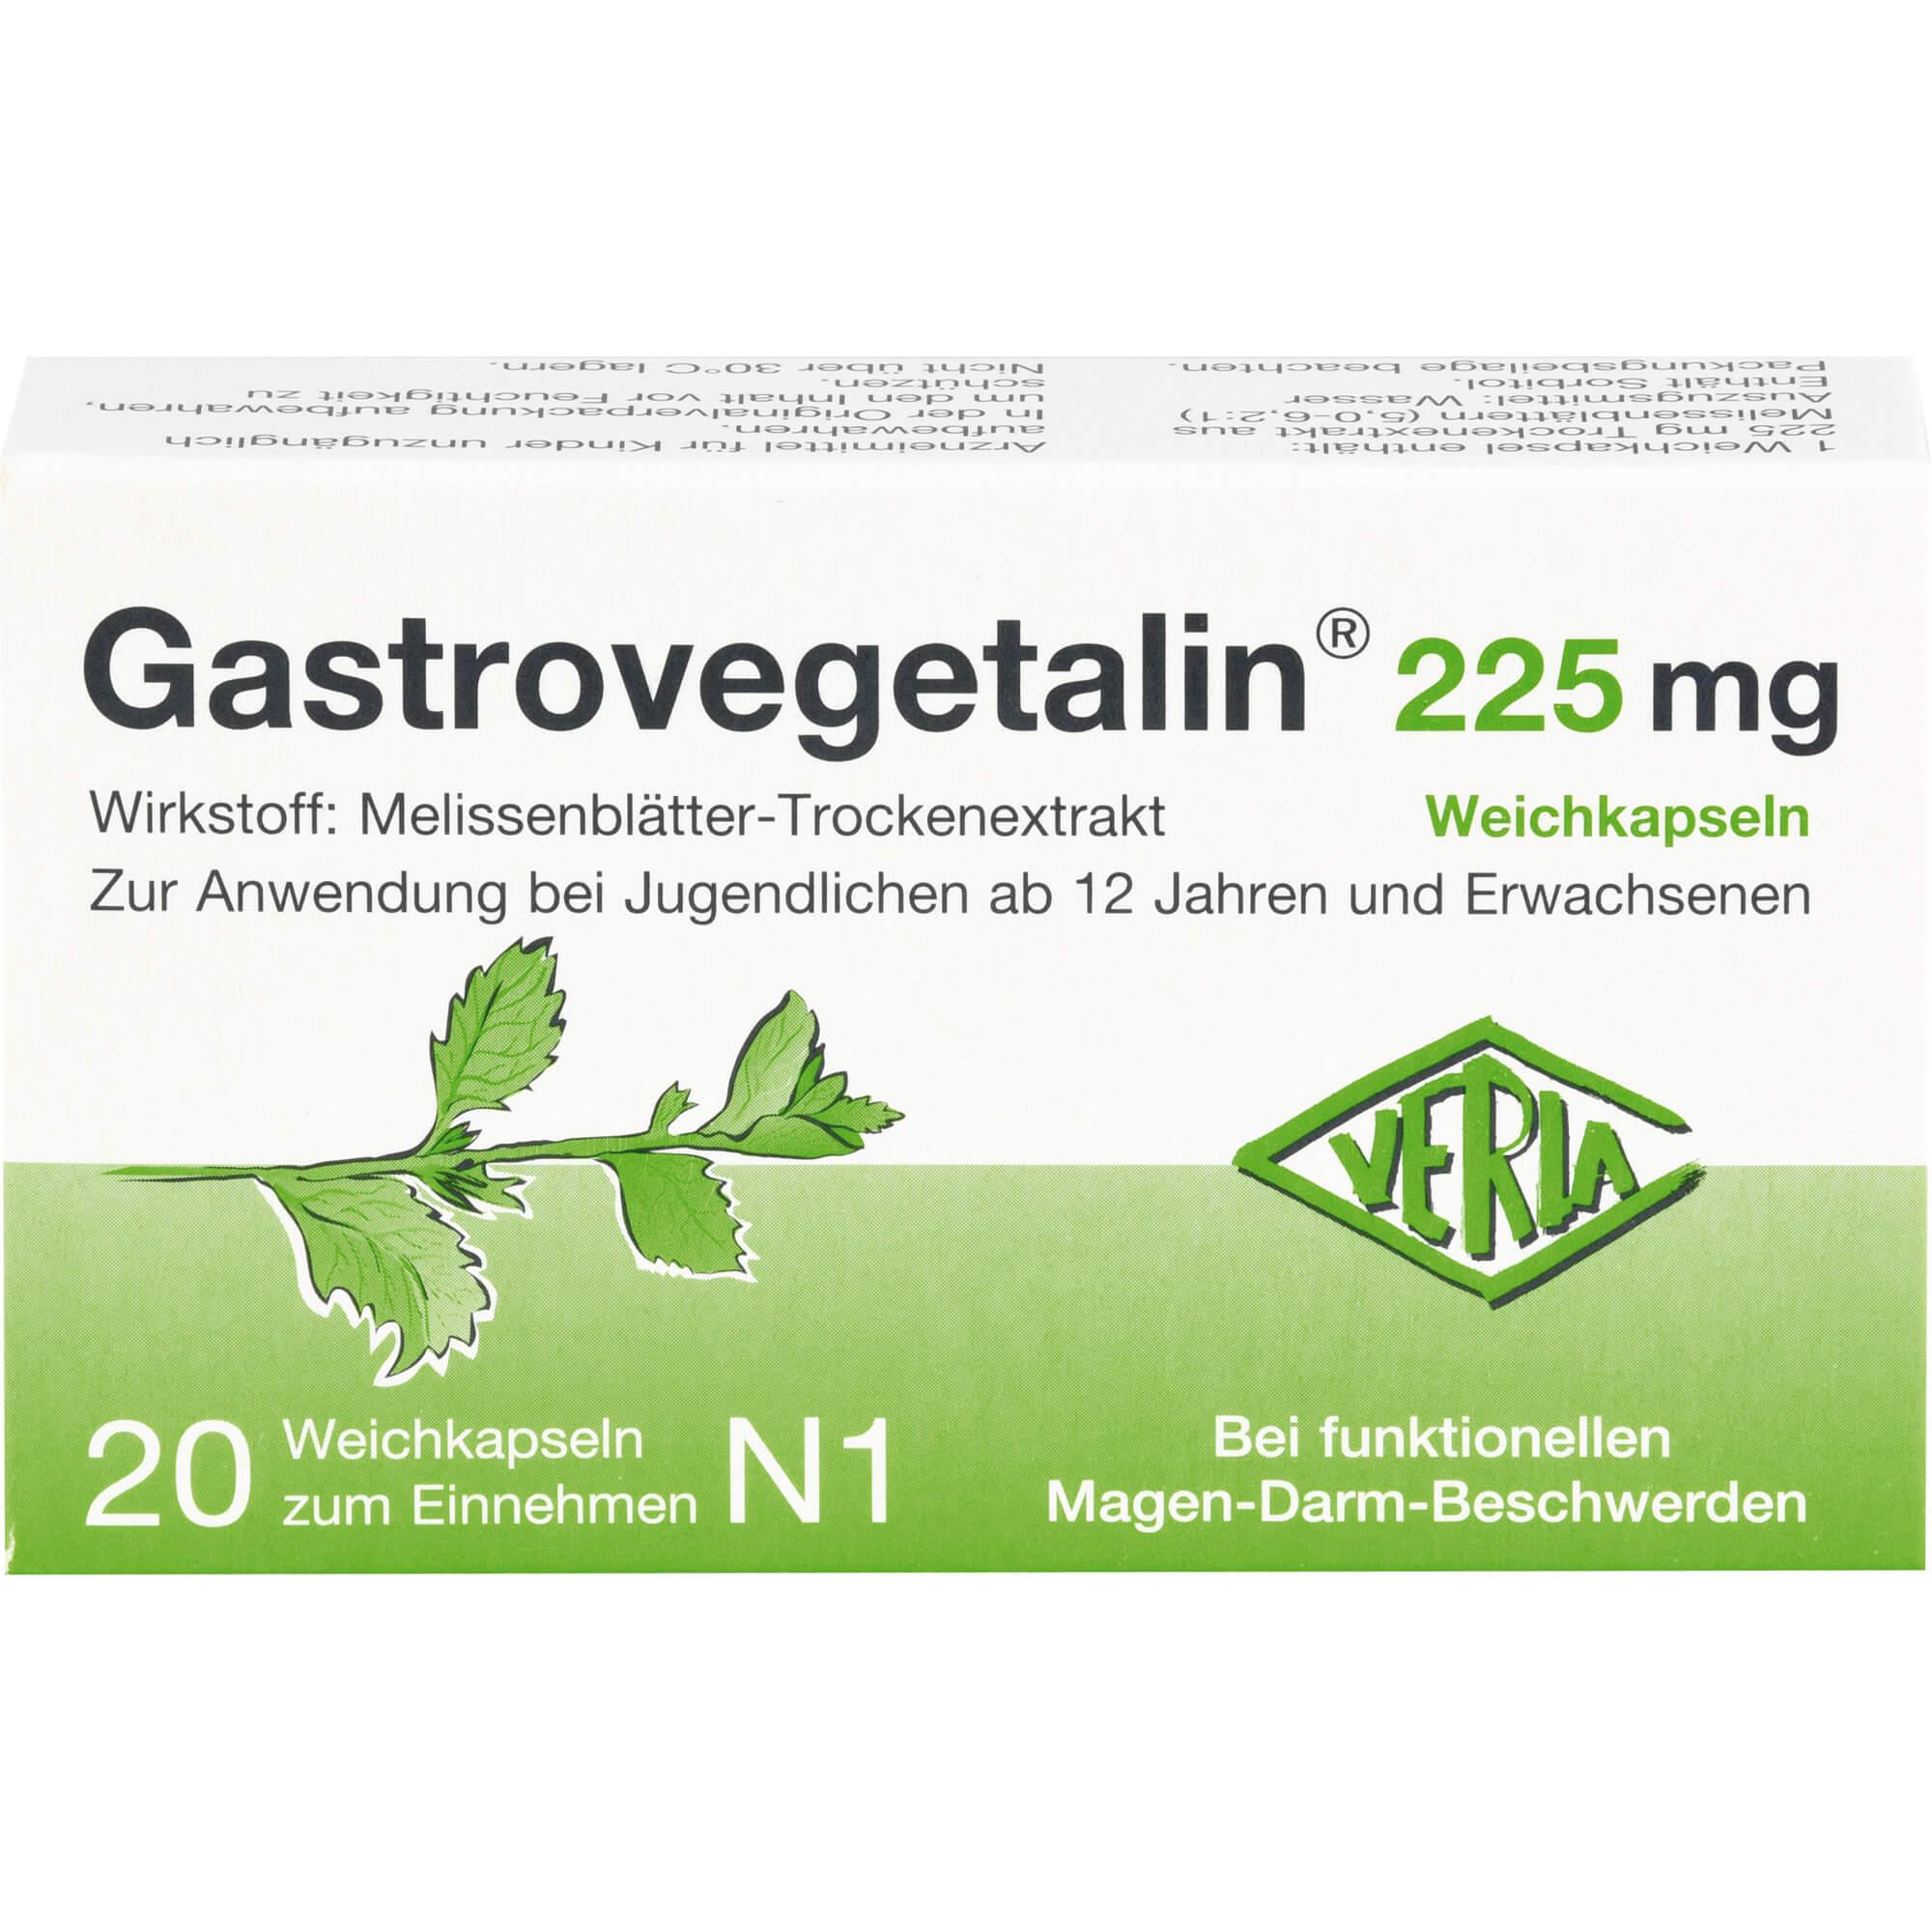 GASTROVEGETALIN 225 mg Weichkapseln